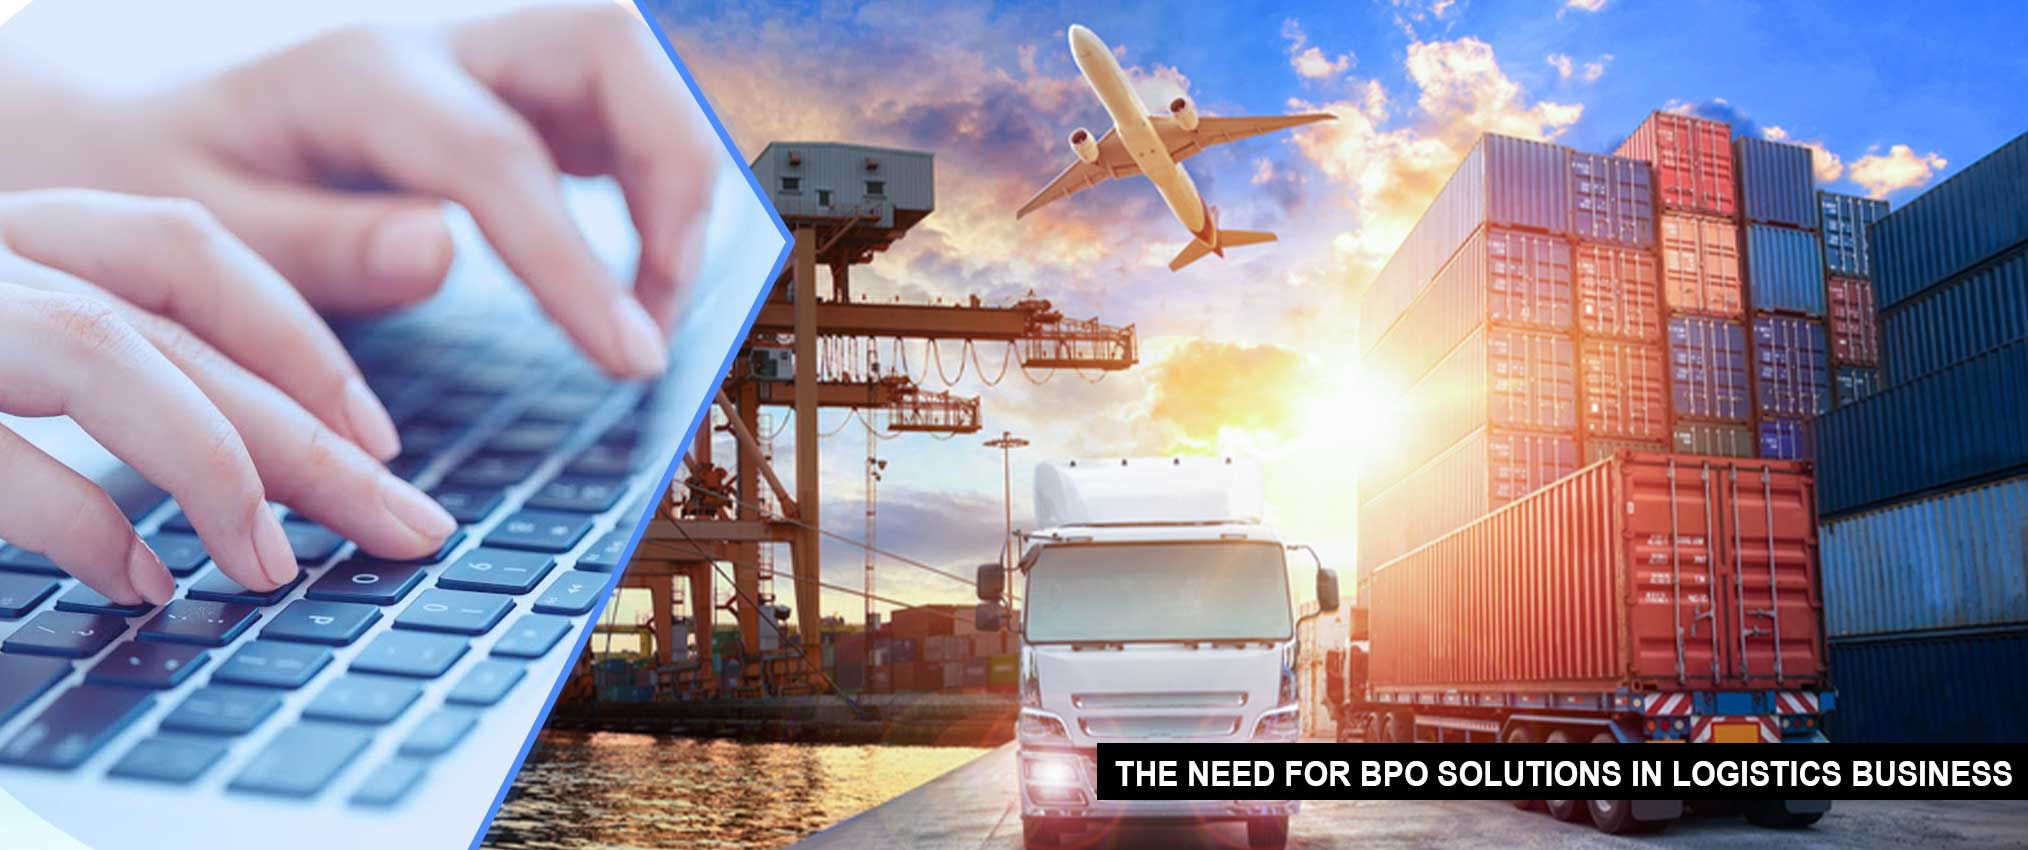 logistics-business